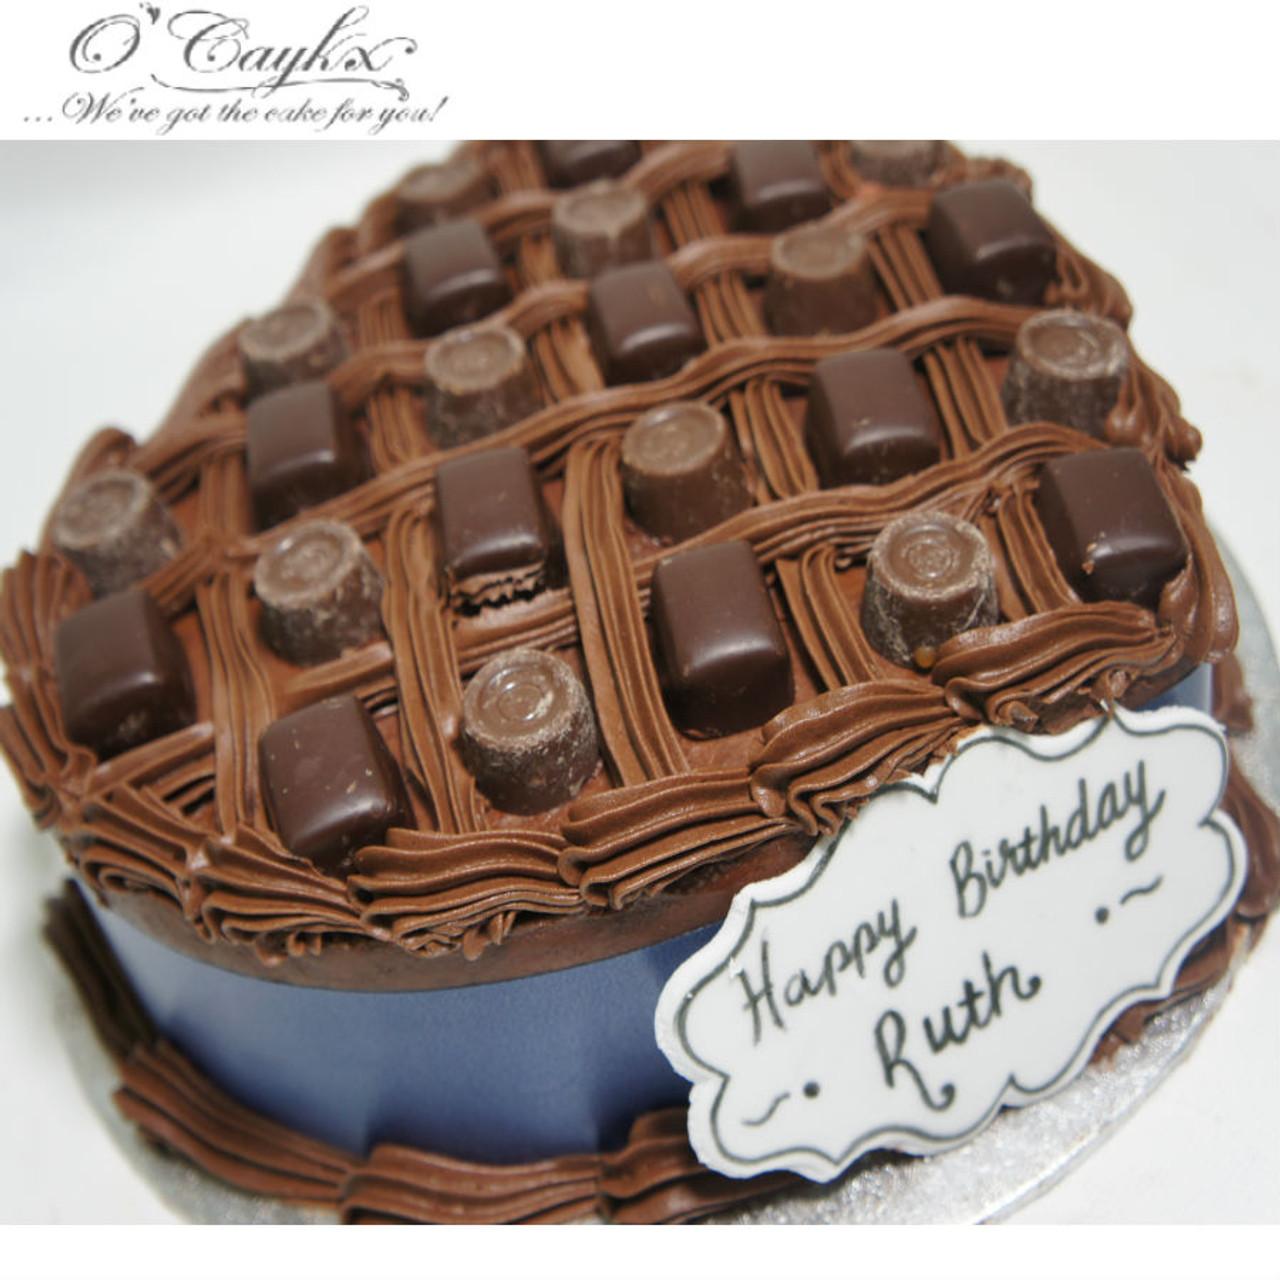 Love Heart Chocolate Box Cake